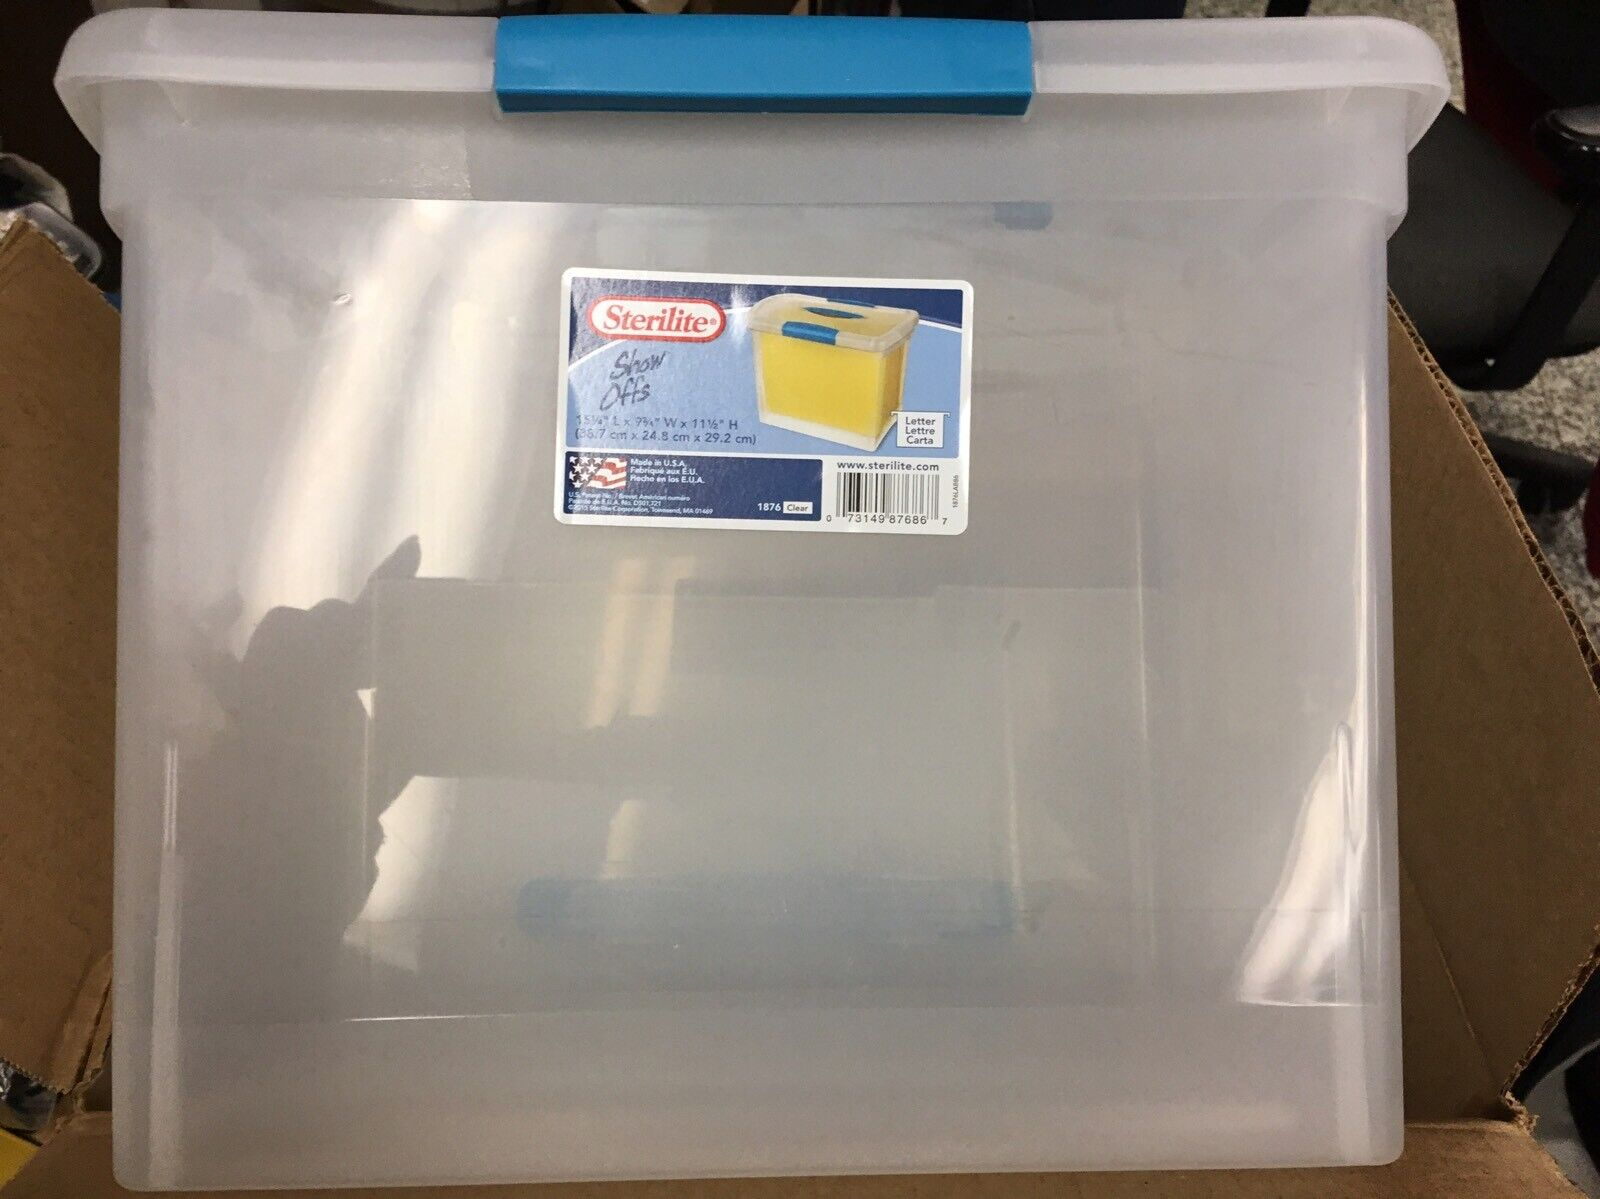 6 Sterilite Clear Large Letter Tote 18768606 15.25 L x 9.75 W x 11.5 H Nesting